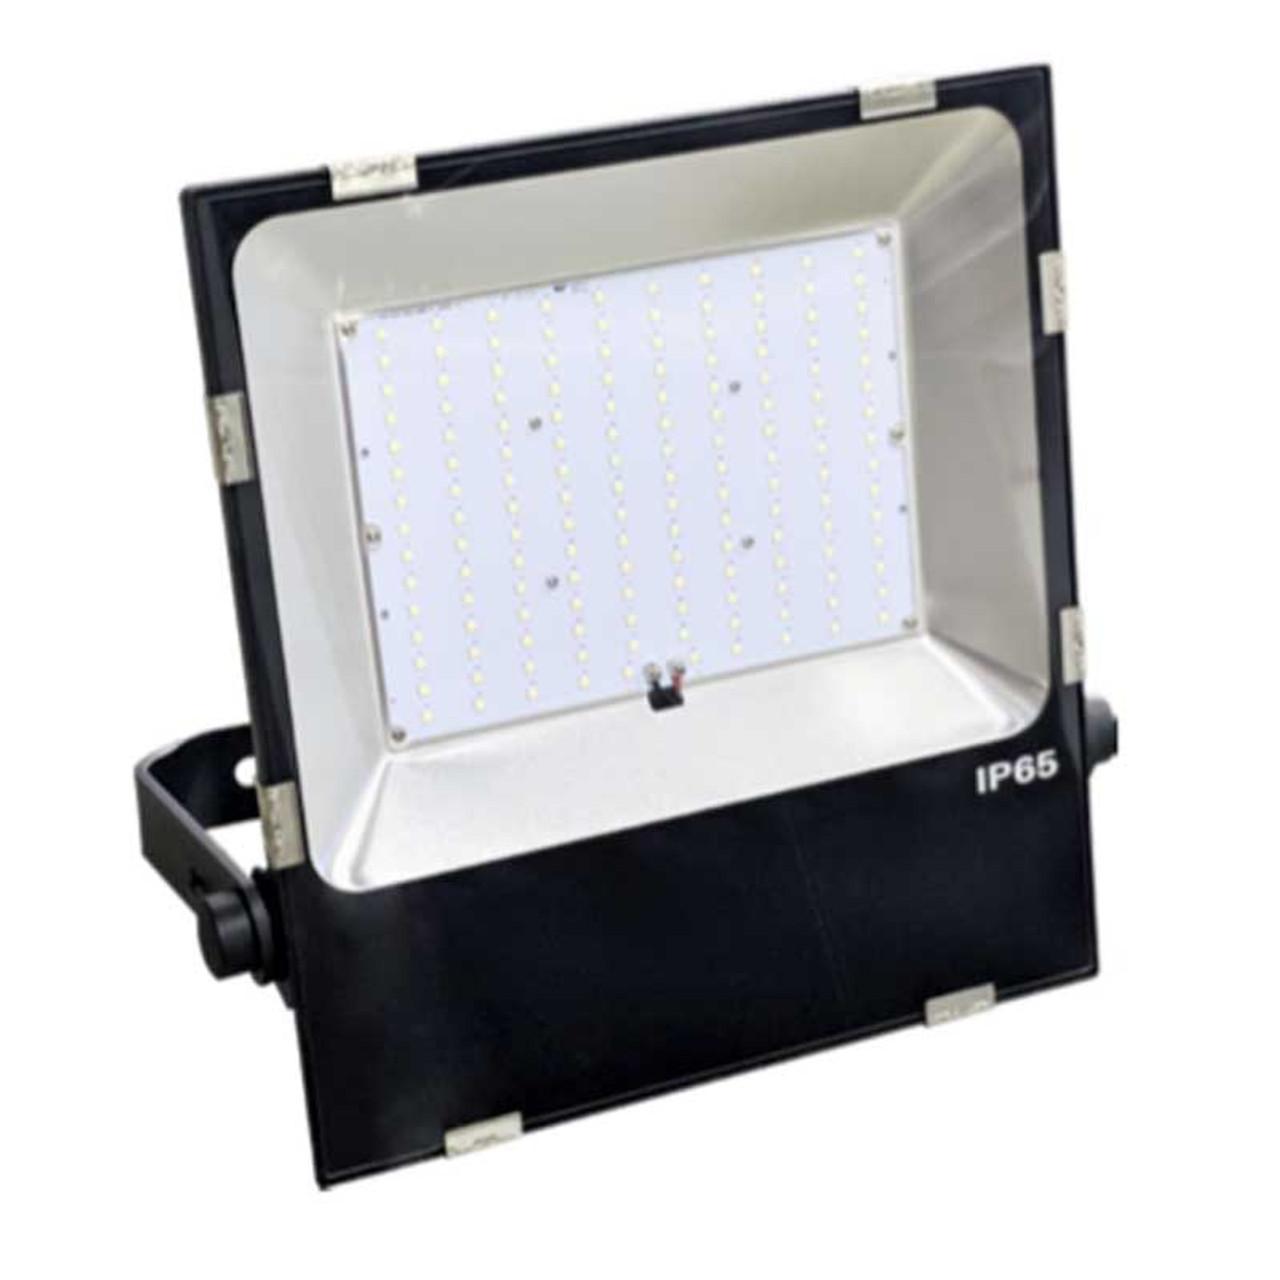 150 Watt Led Flood Light Replaces 700 Watt Hid 20 300 Lumen Ip65 Close Out Led Global Supply